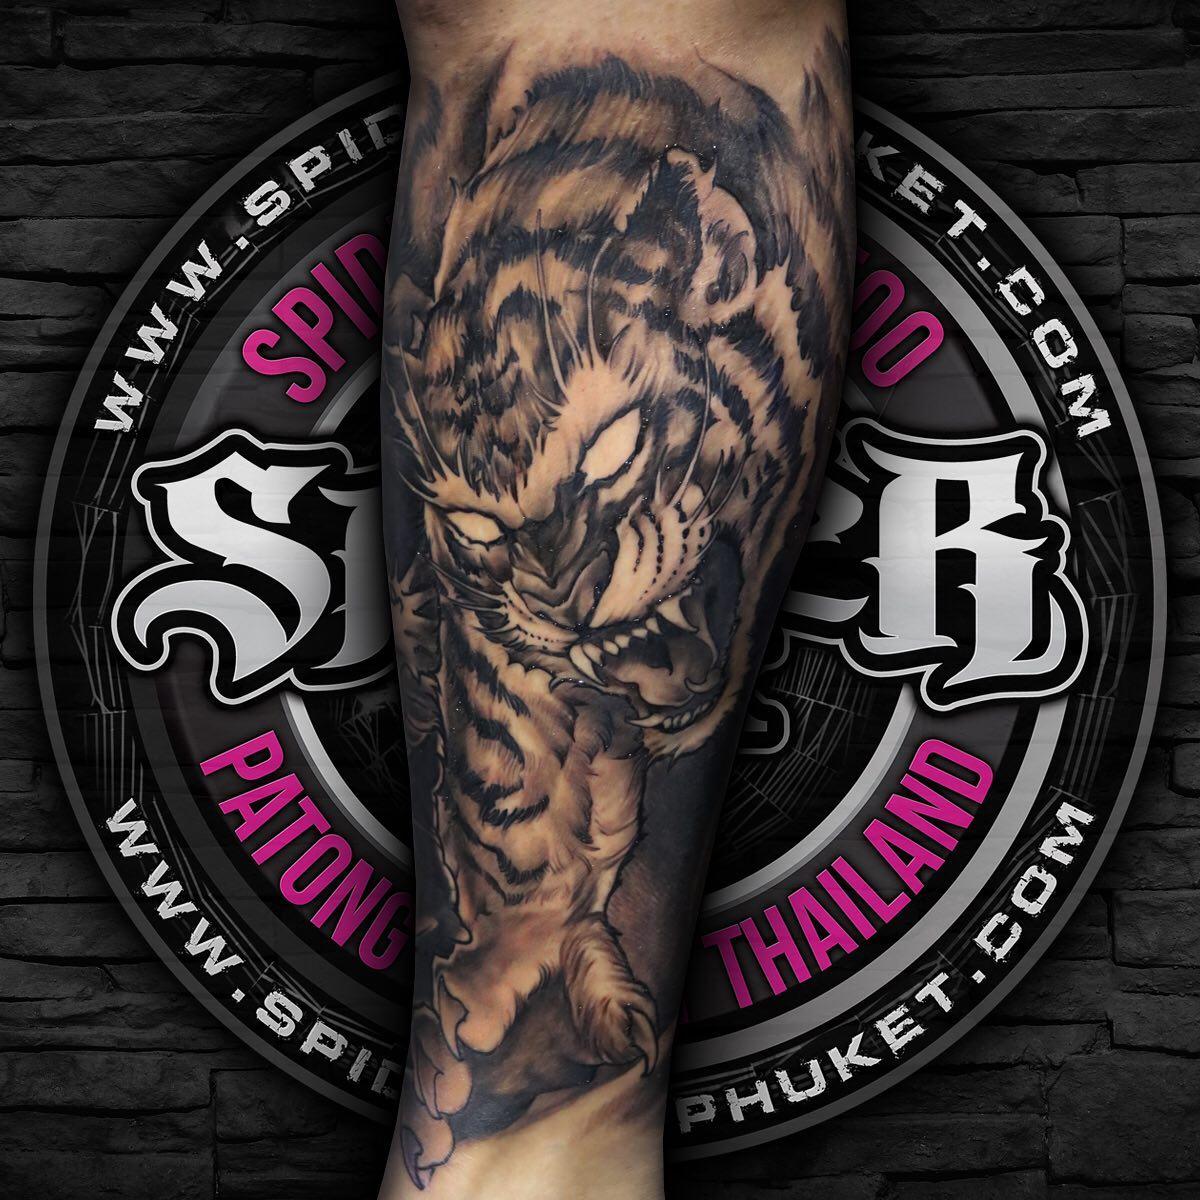 Spider Ink Phuket Tattoo Studio